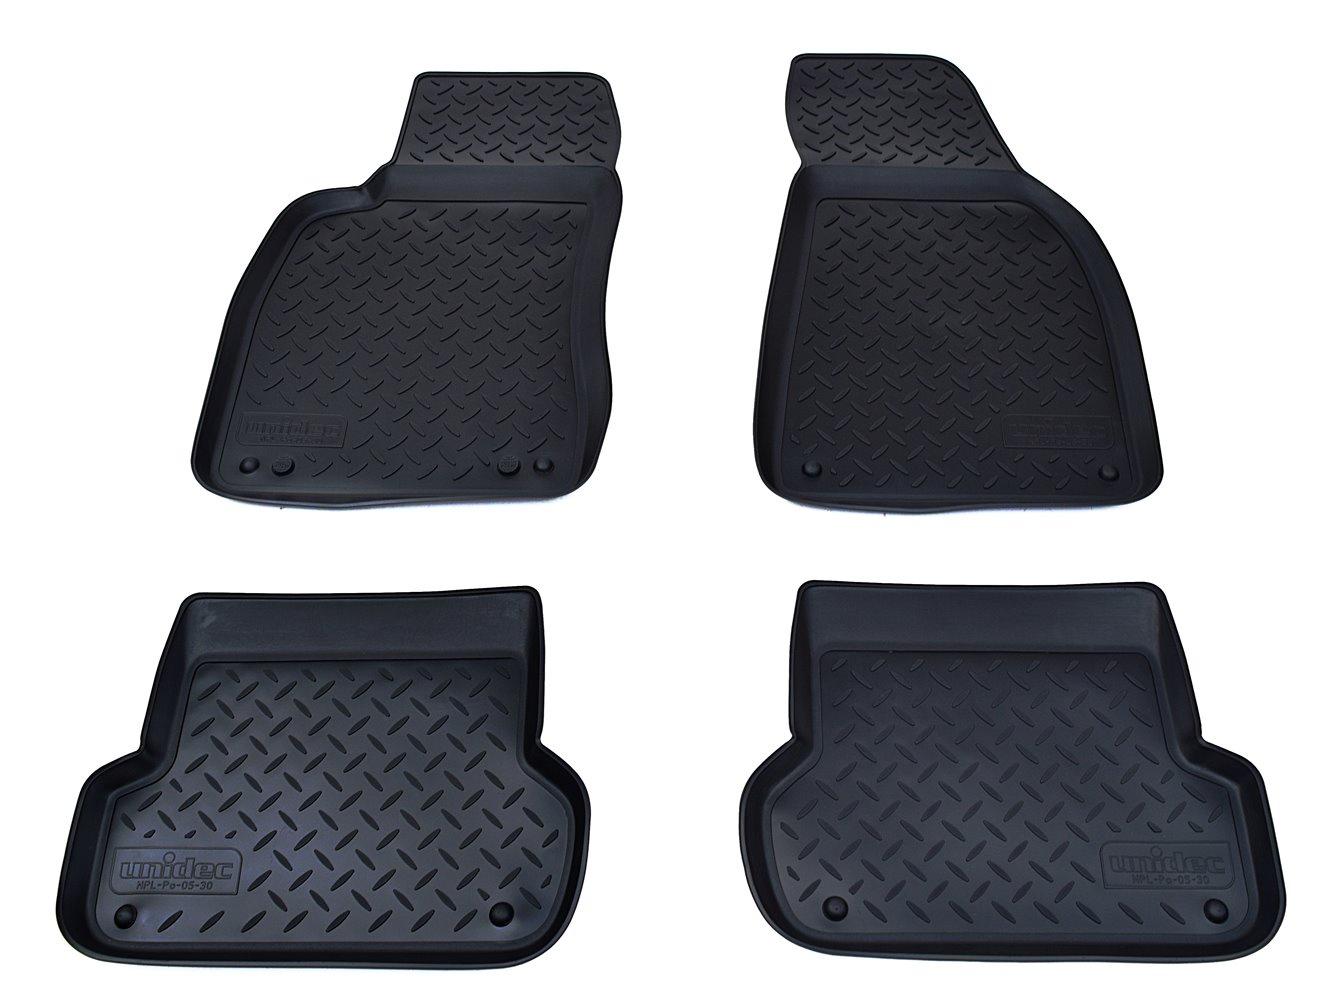 купить Коврики в салон автомобиля Norplast для Audi A4 B6:8E/B7:8E 2001-2007, NPL-Po-05-30, черный онлайн